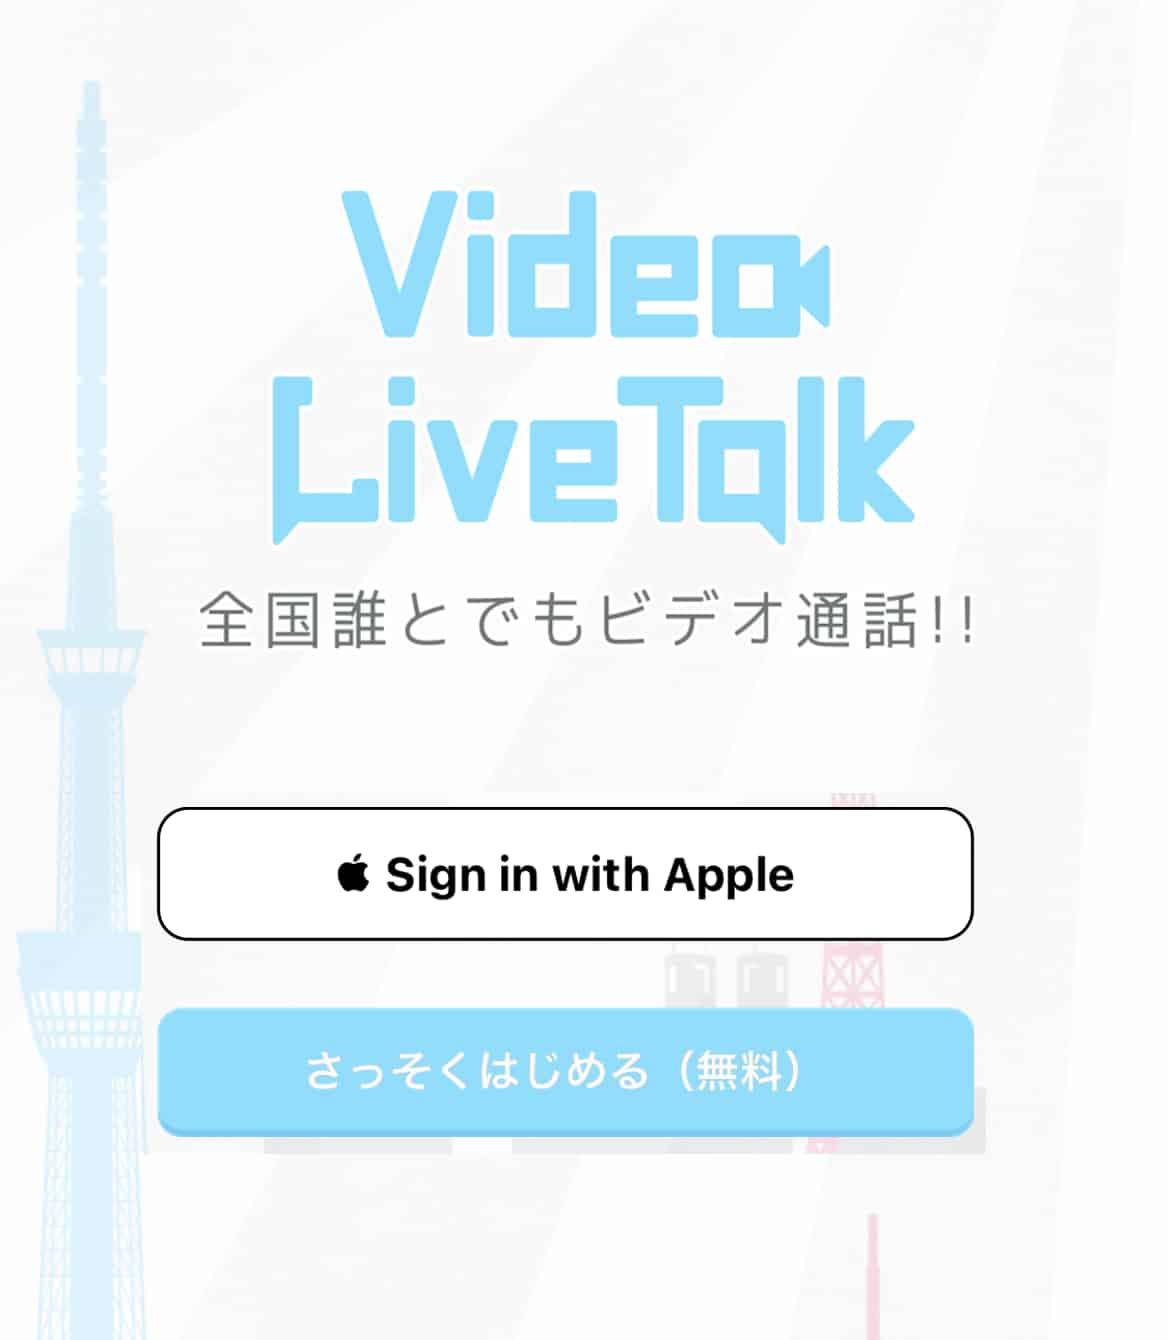 VideoLiveTalk(ビデオライブトーク)登録方法